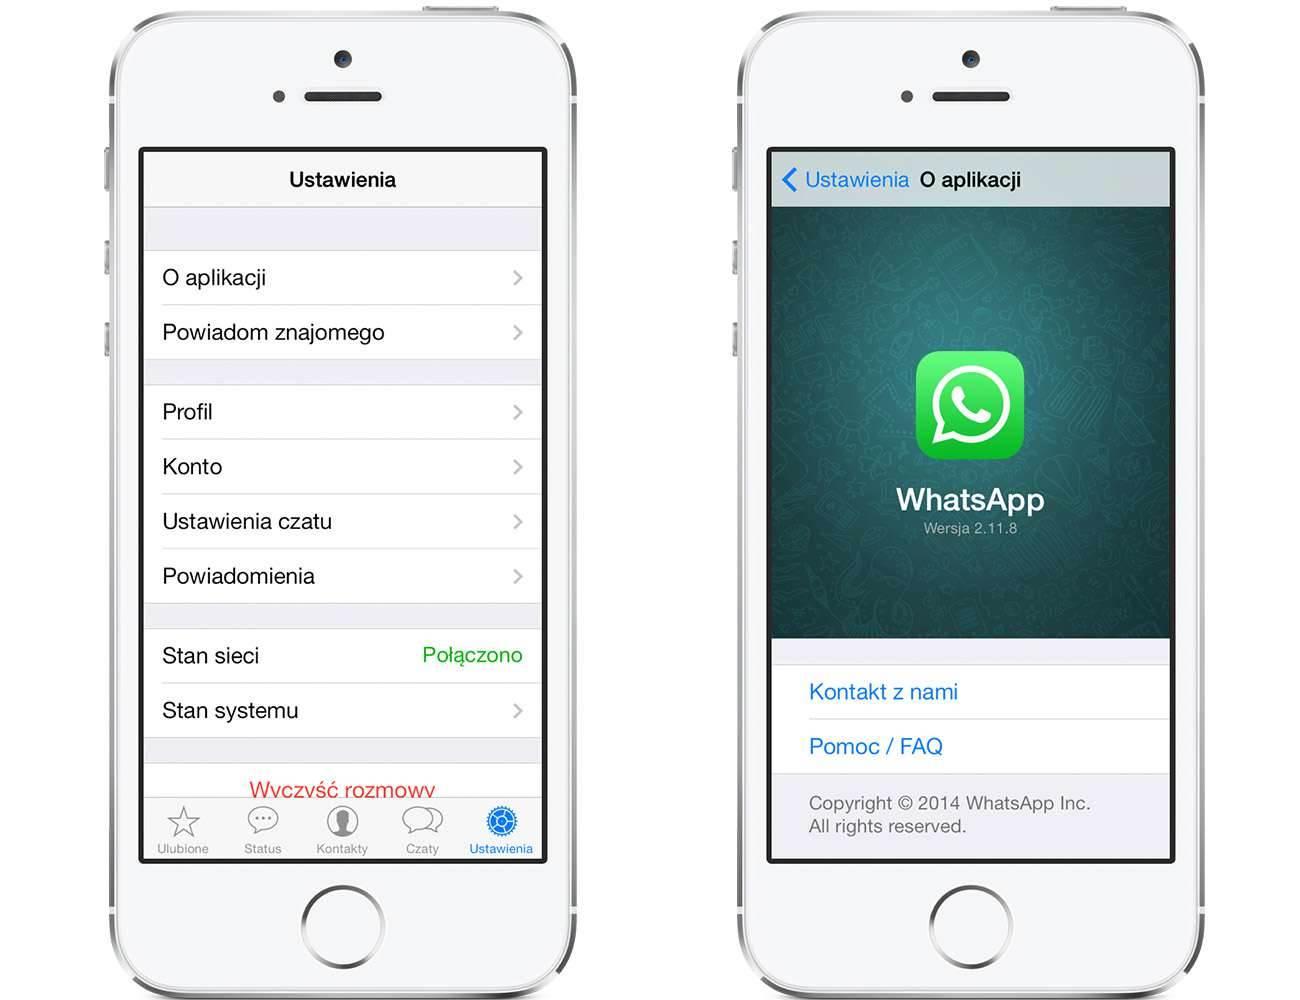 WhatsApp.onetech.pl